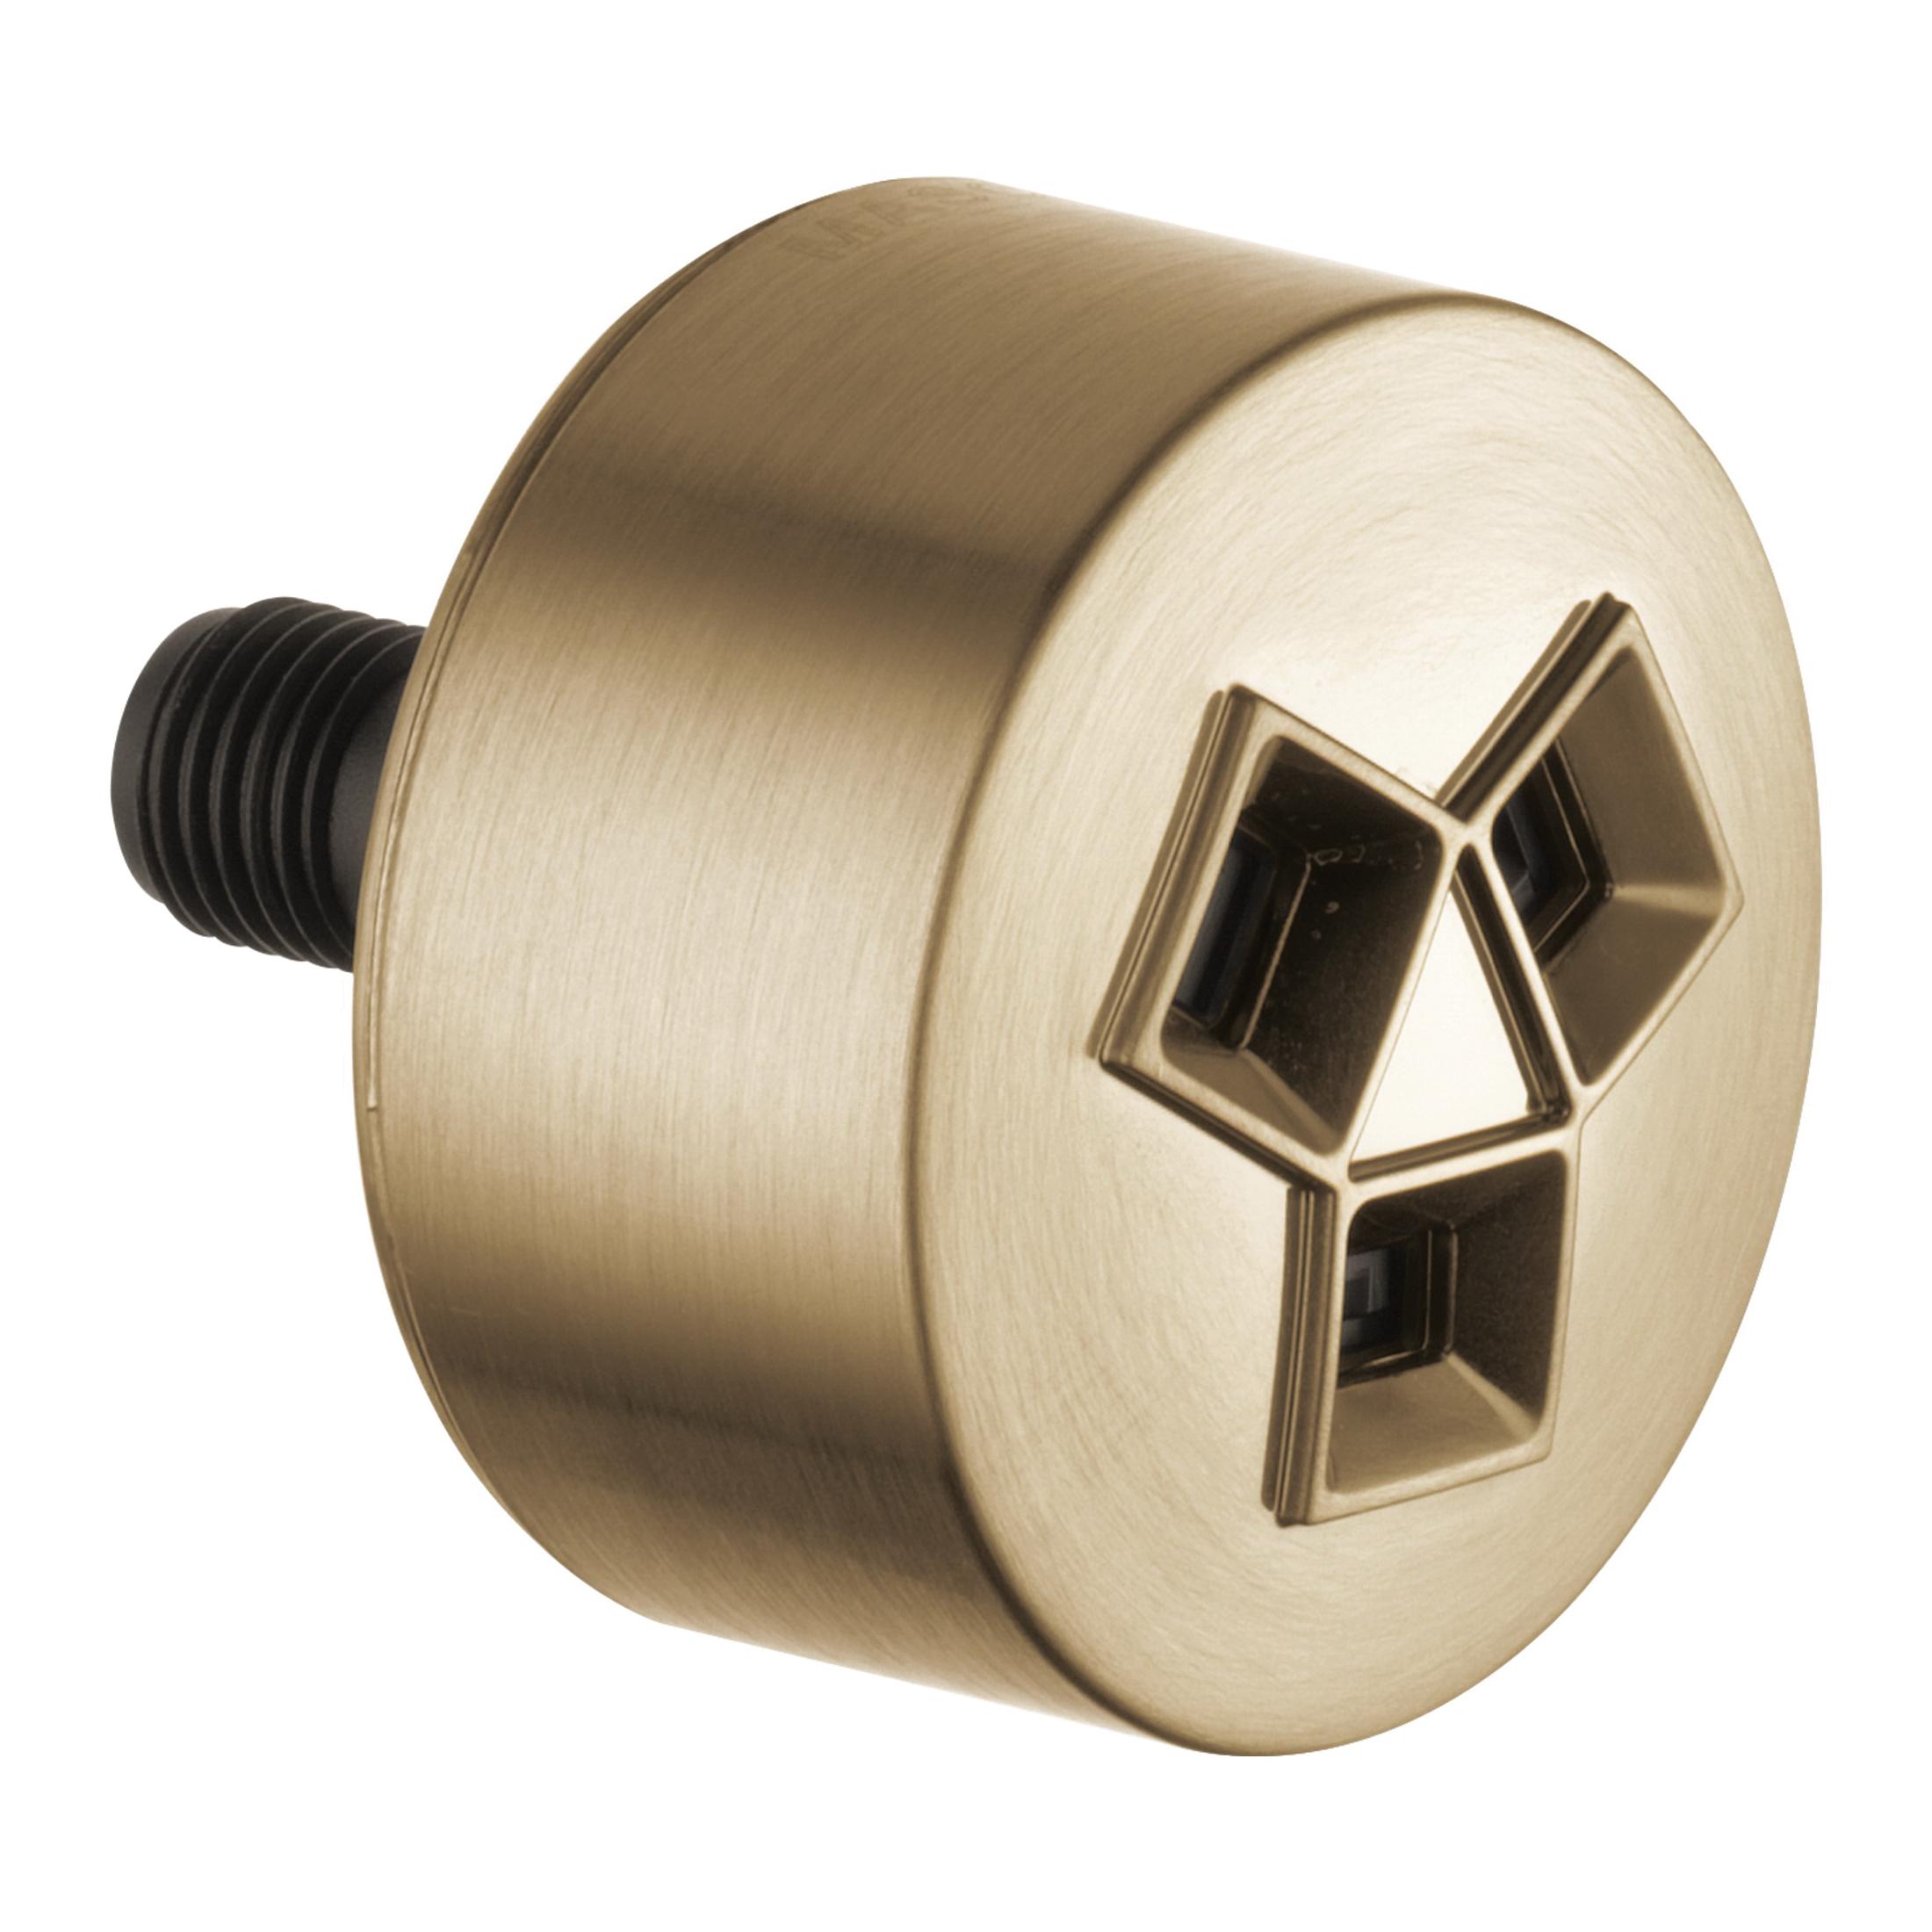 Brizo® HydraChoice™ Maximum SH84102-GL Body Spray Head, (1) Invigorating Spray, 1.5 gpm Maximum, Wall Mount, Import